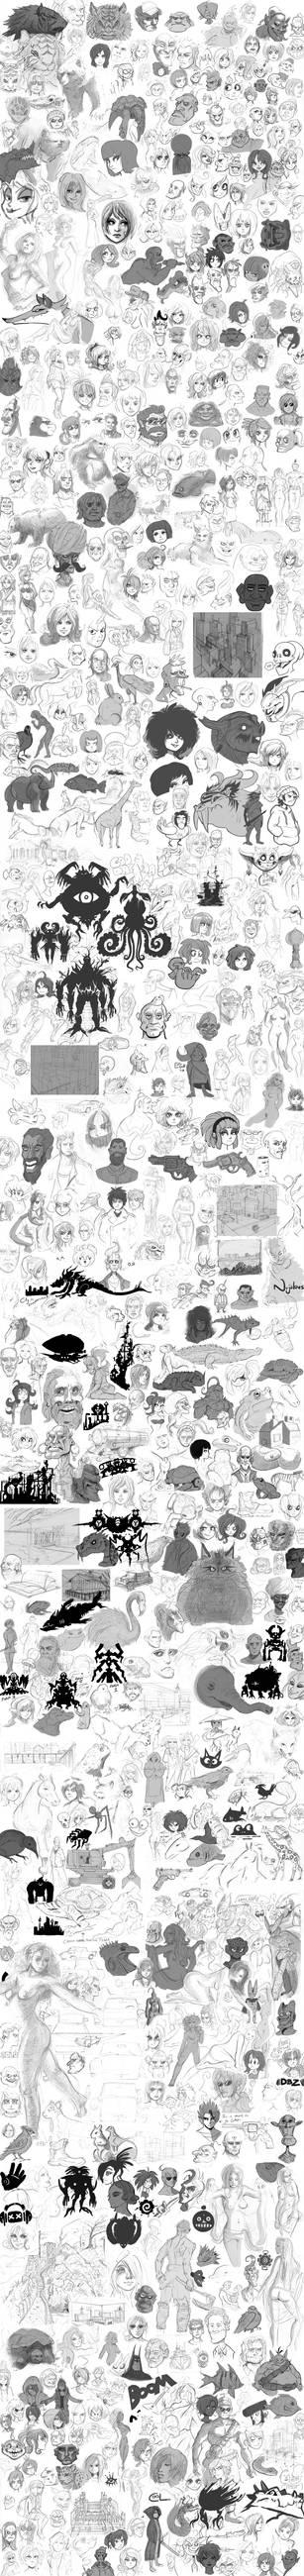 ultra massive torrent of drawings 2012